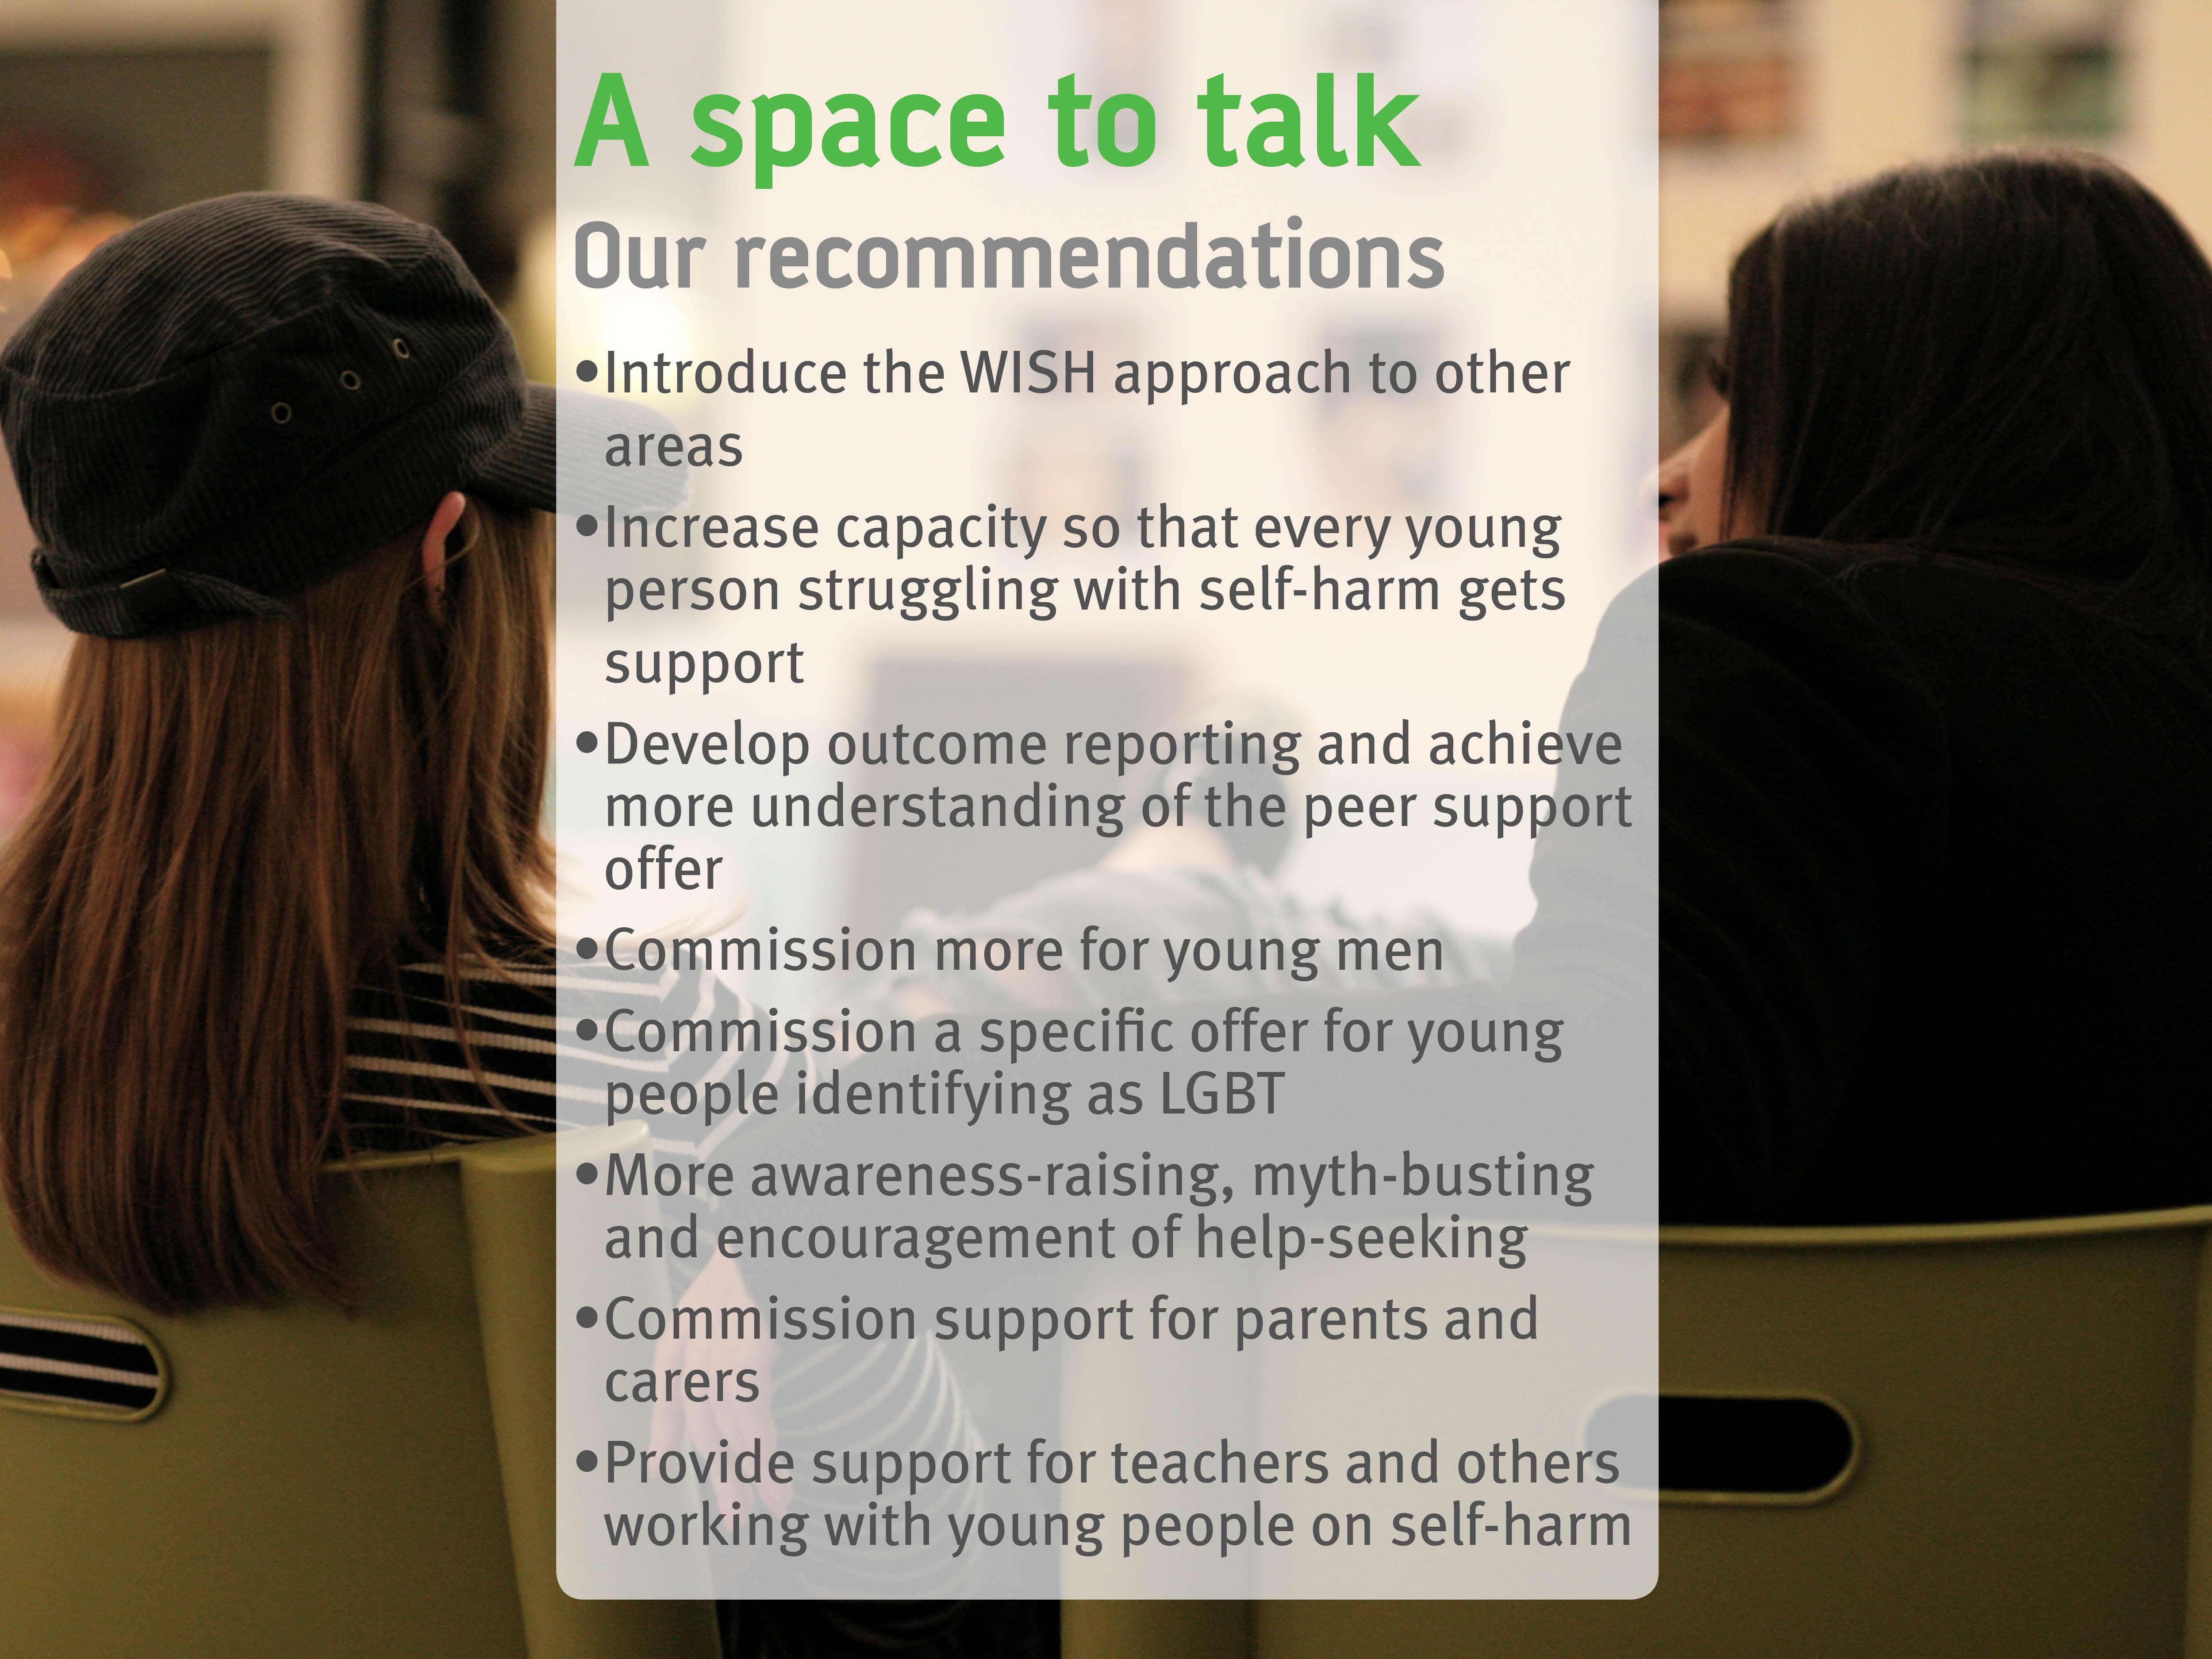 centreformentalhealth.org.uk - A space to talk